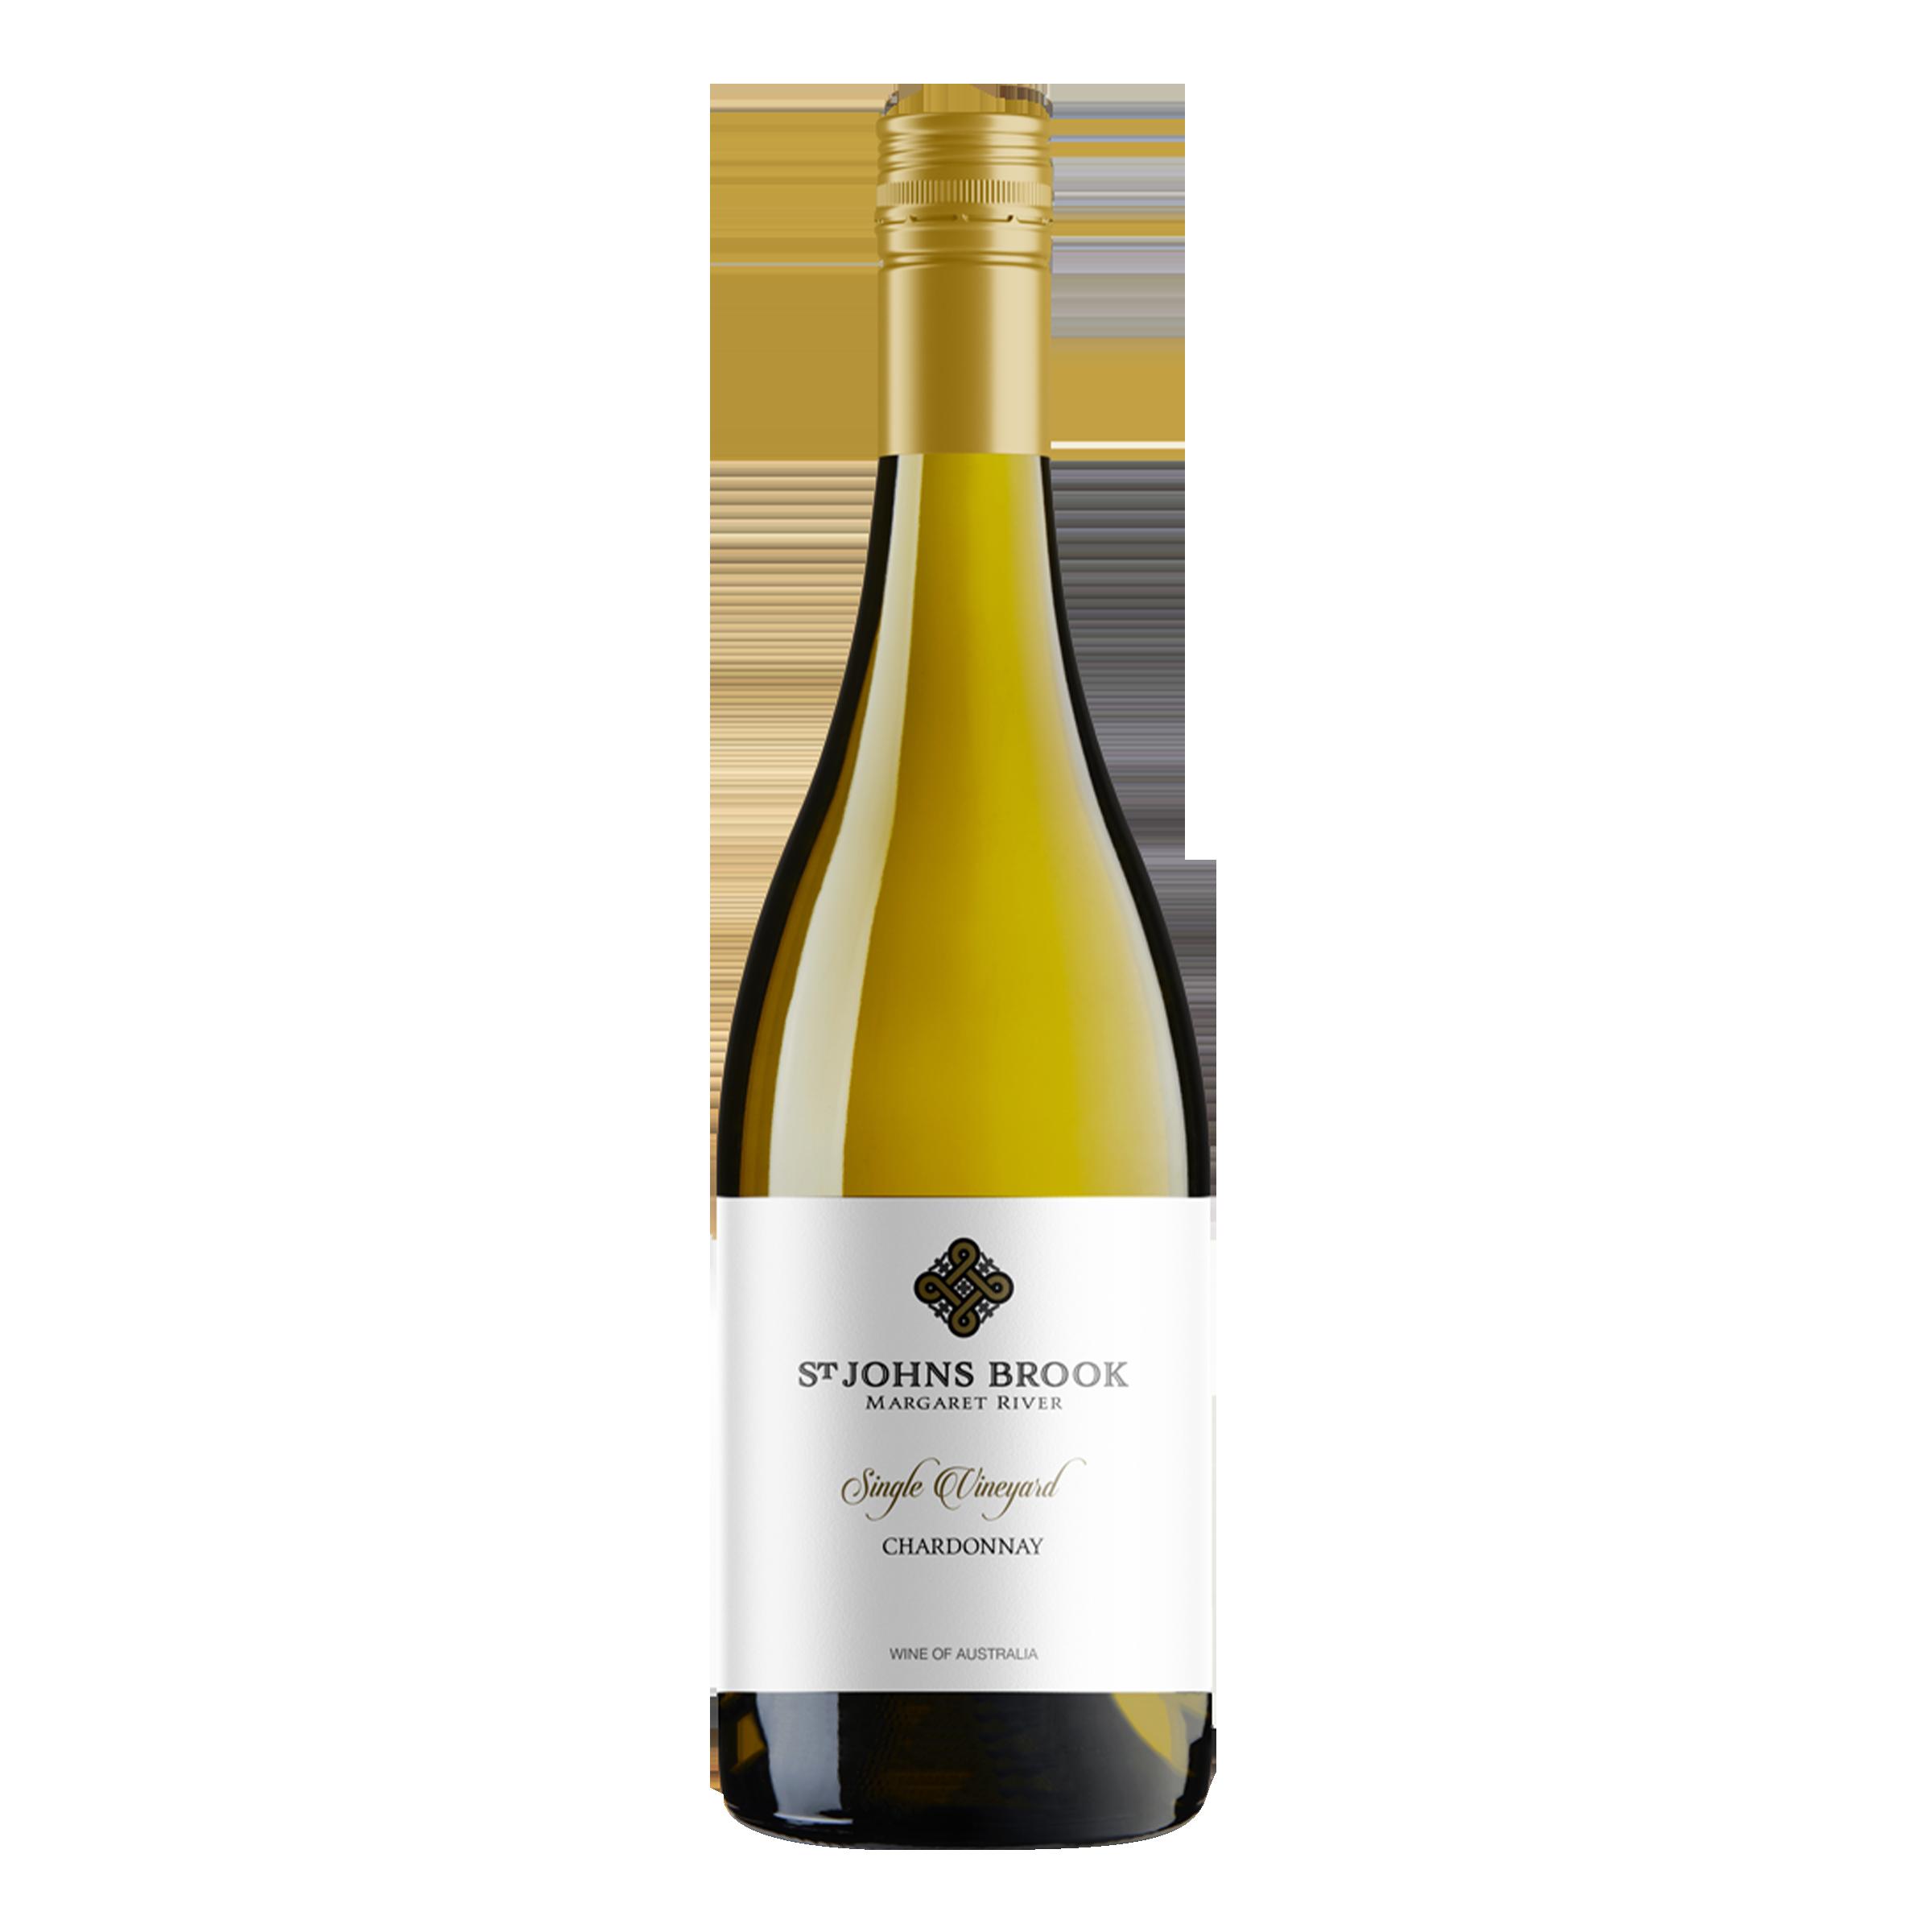 St Johns Brook Single Vineyard Chardonnay